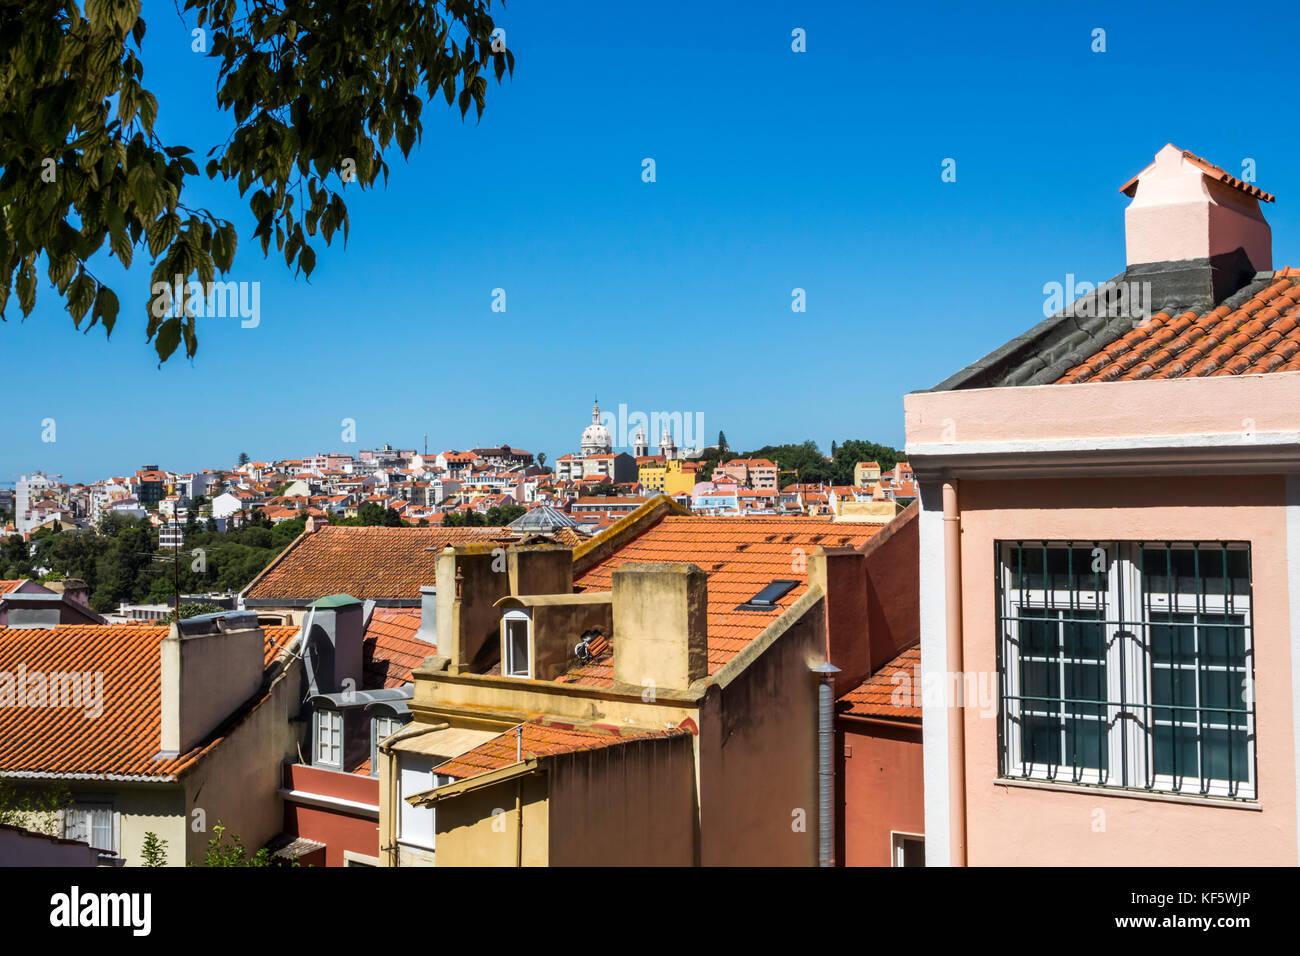 Lisbon Portugal Bairro Alto Jardim do Principe Real park garden viewpoint city skyline view rooftops red barrel - Stock Image